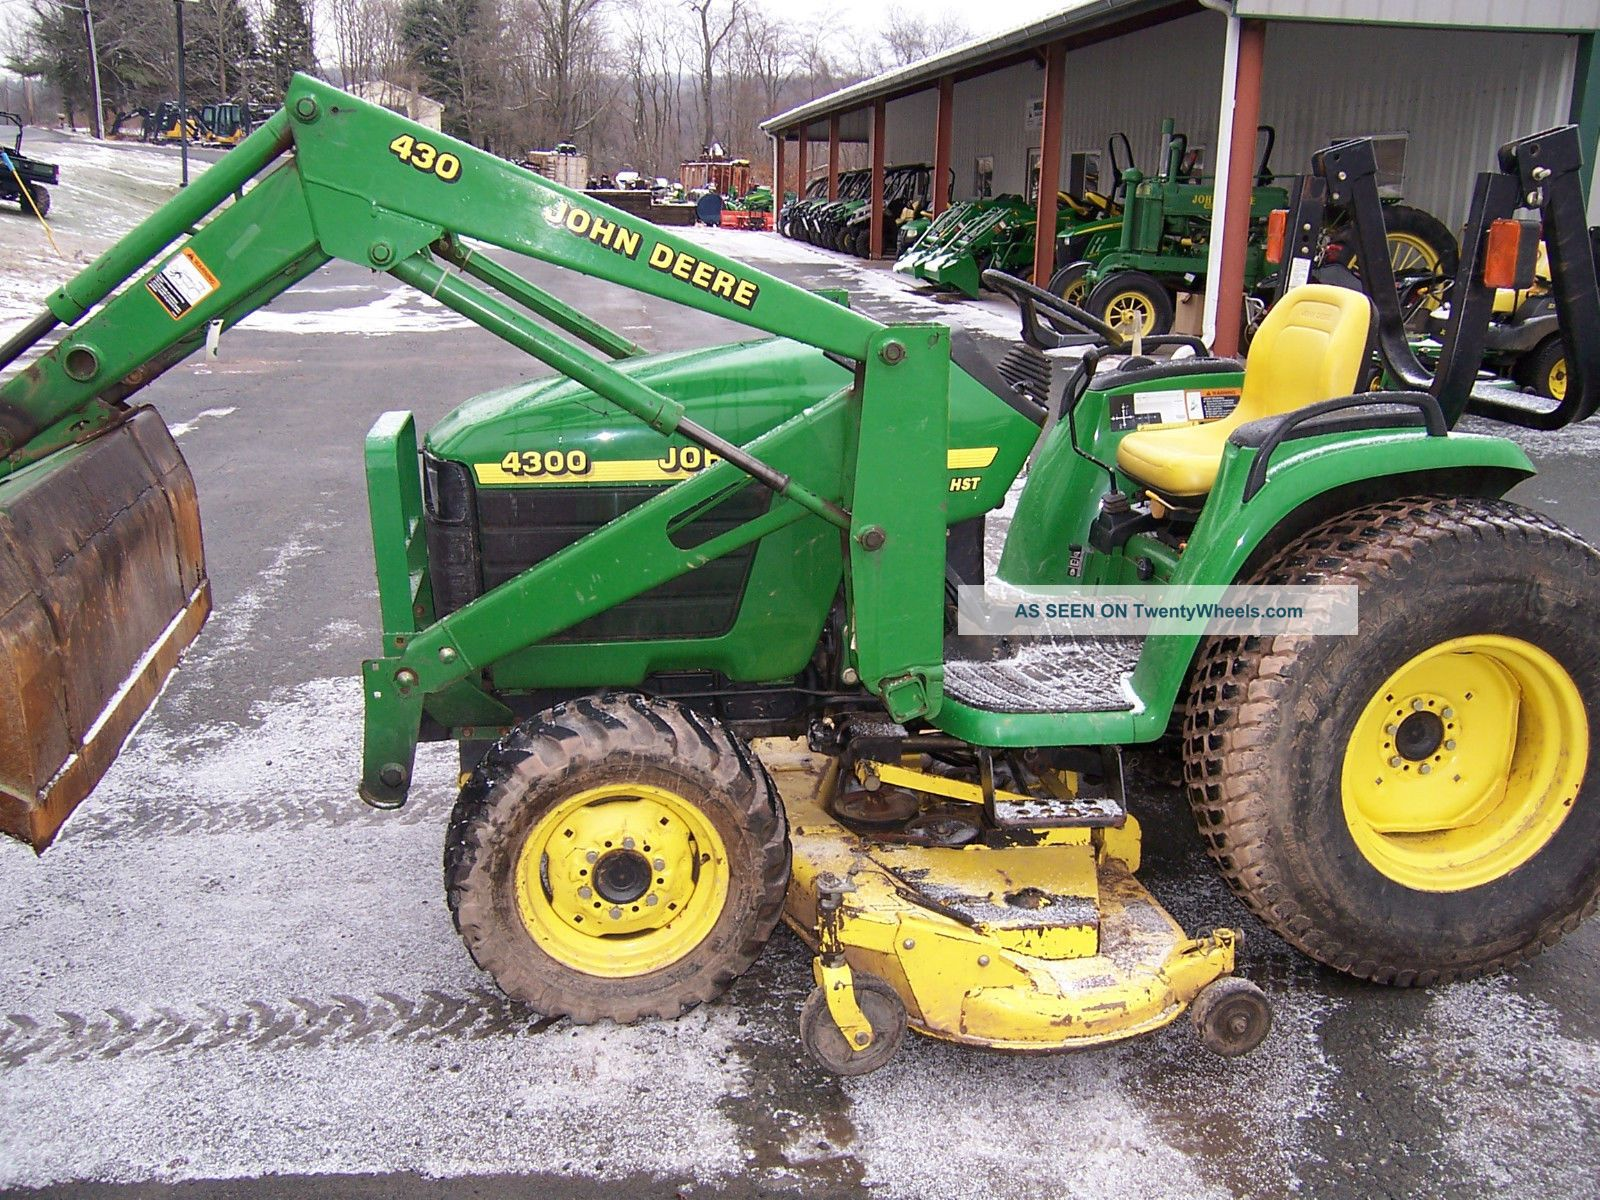 John Deere Tractor Loader Lgw